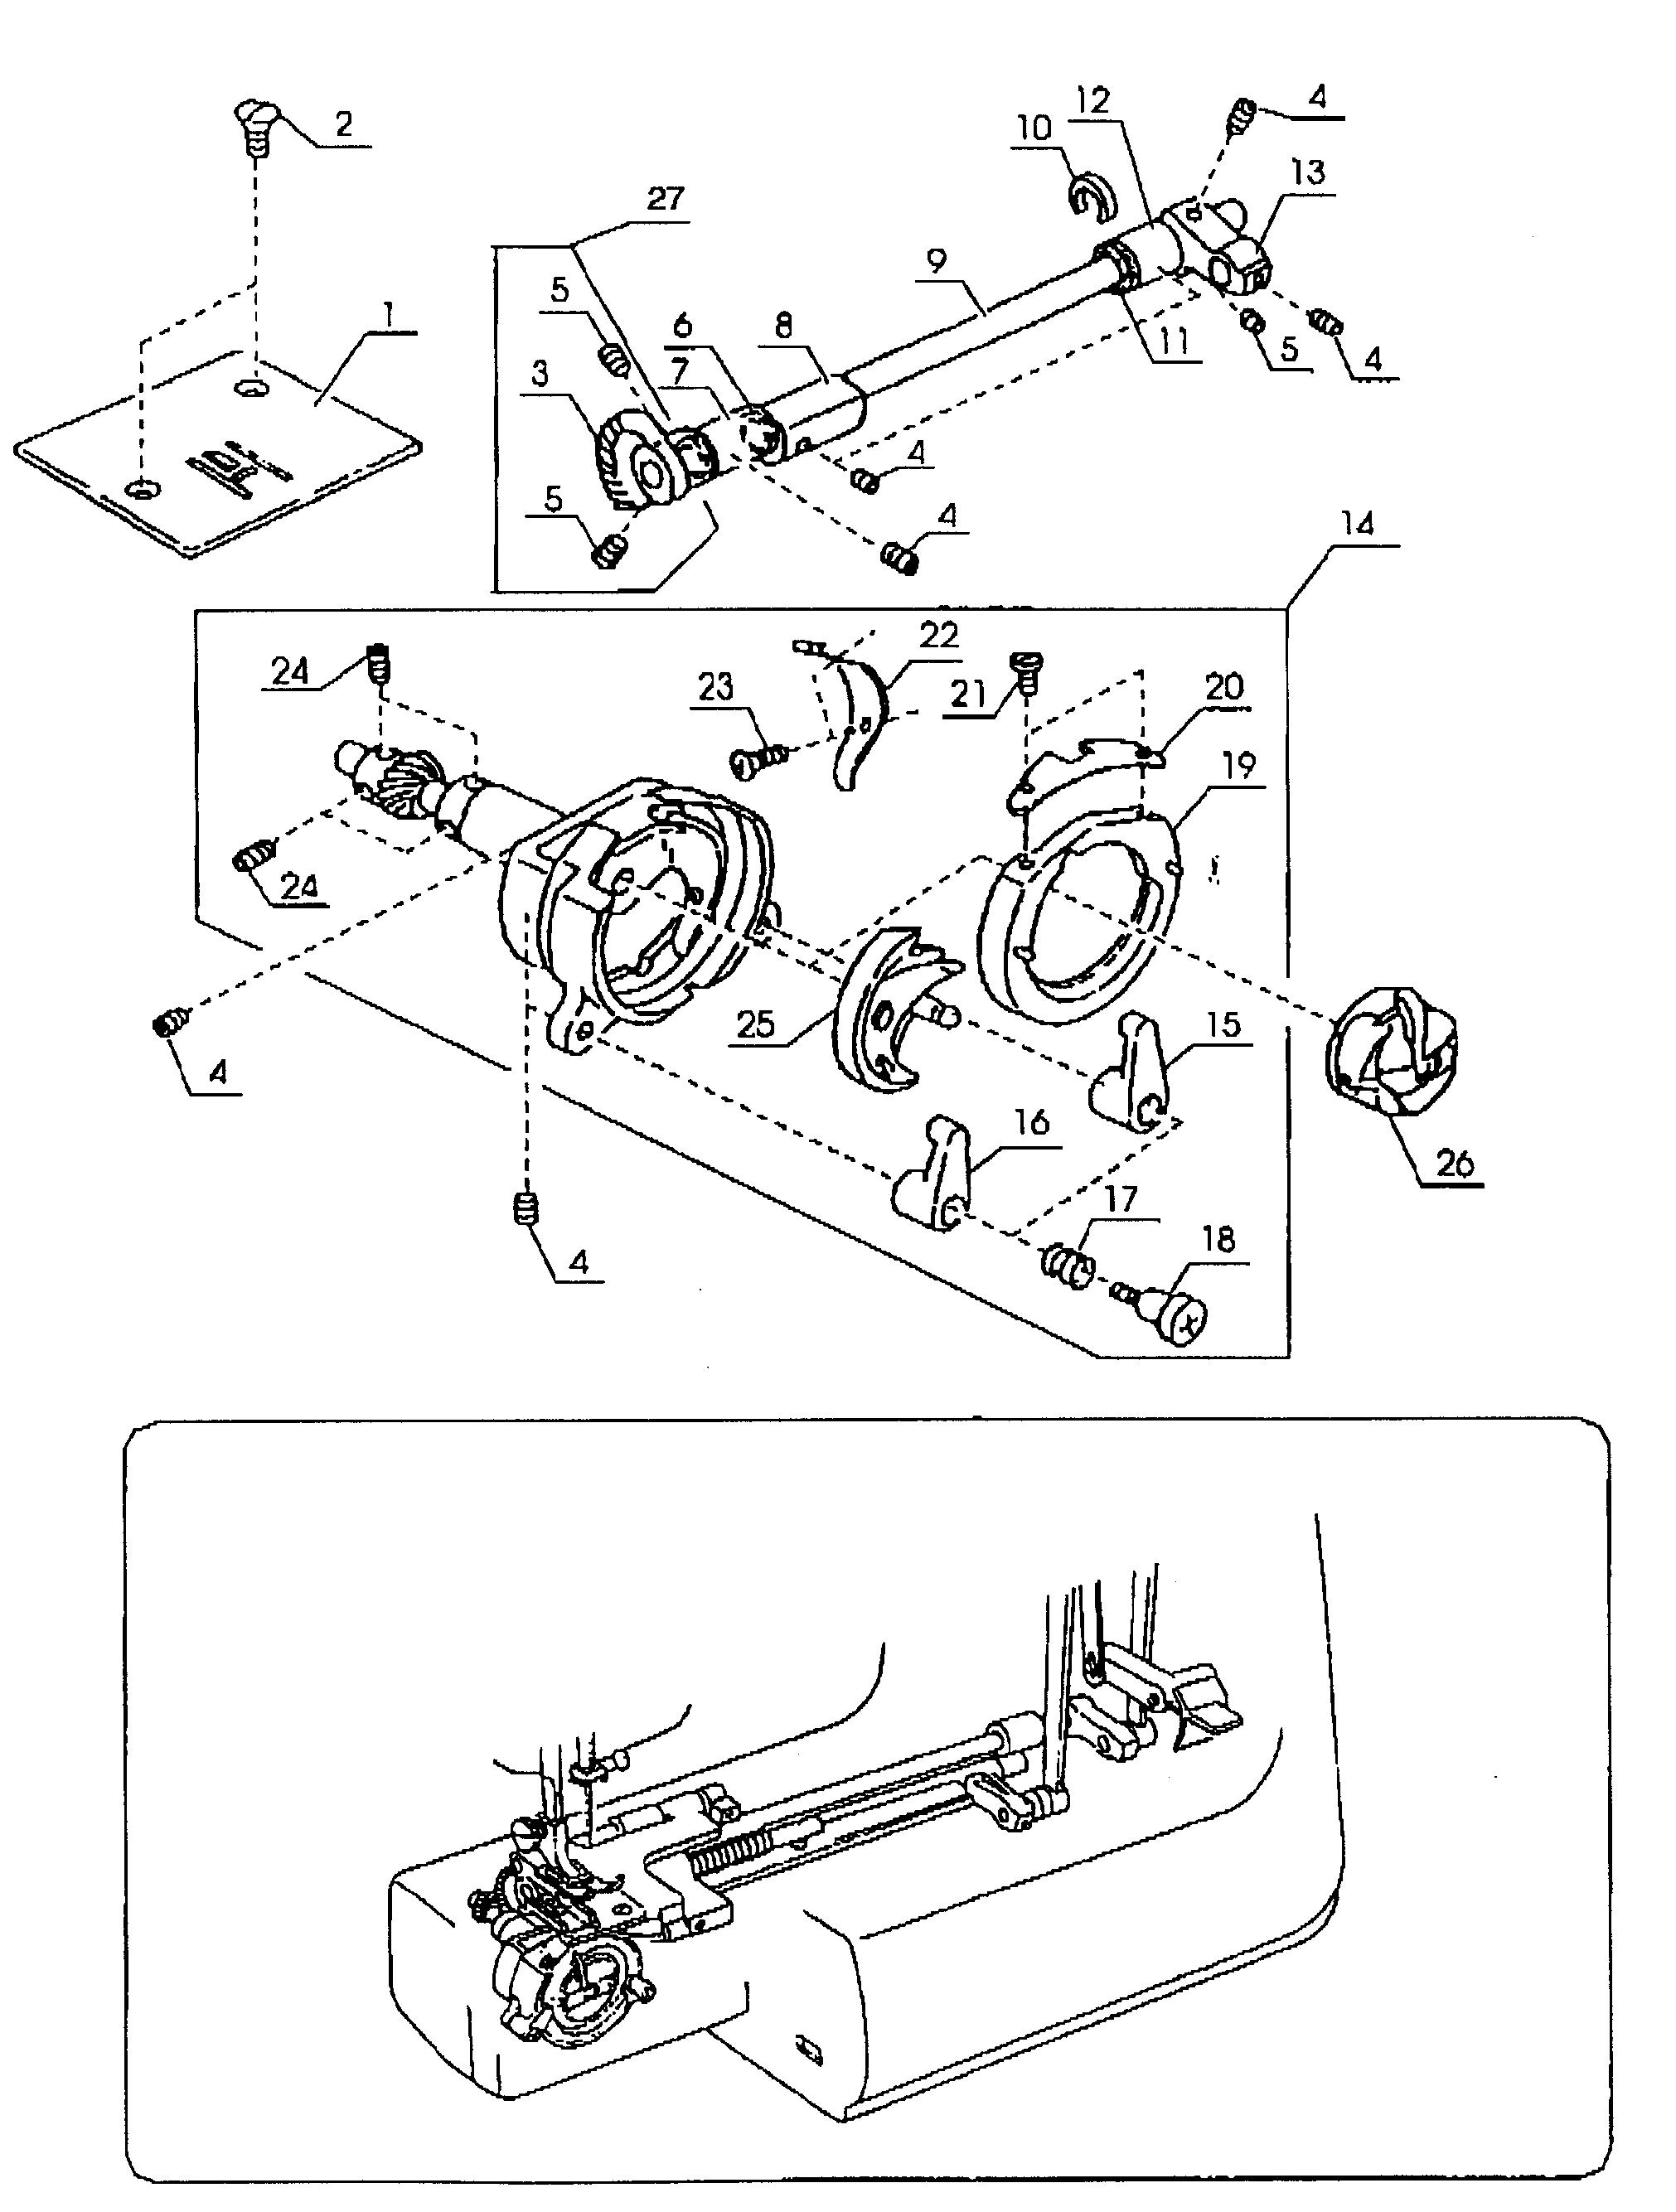 Yerf dog 150cc wiring diagram go kart together with impressive 2004 jeep grand cherokee wiring diagram